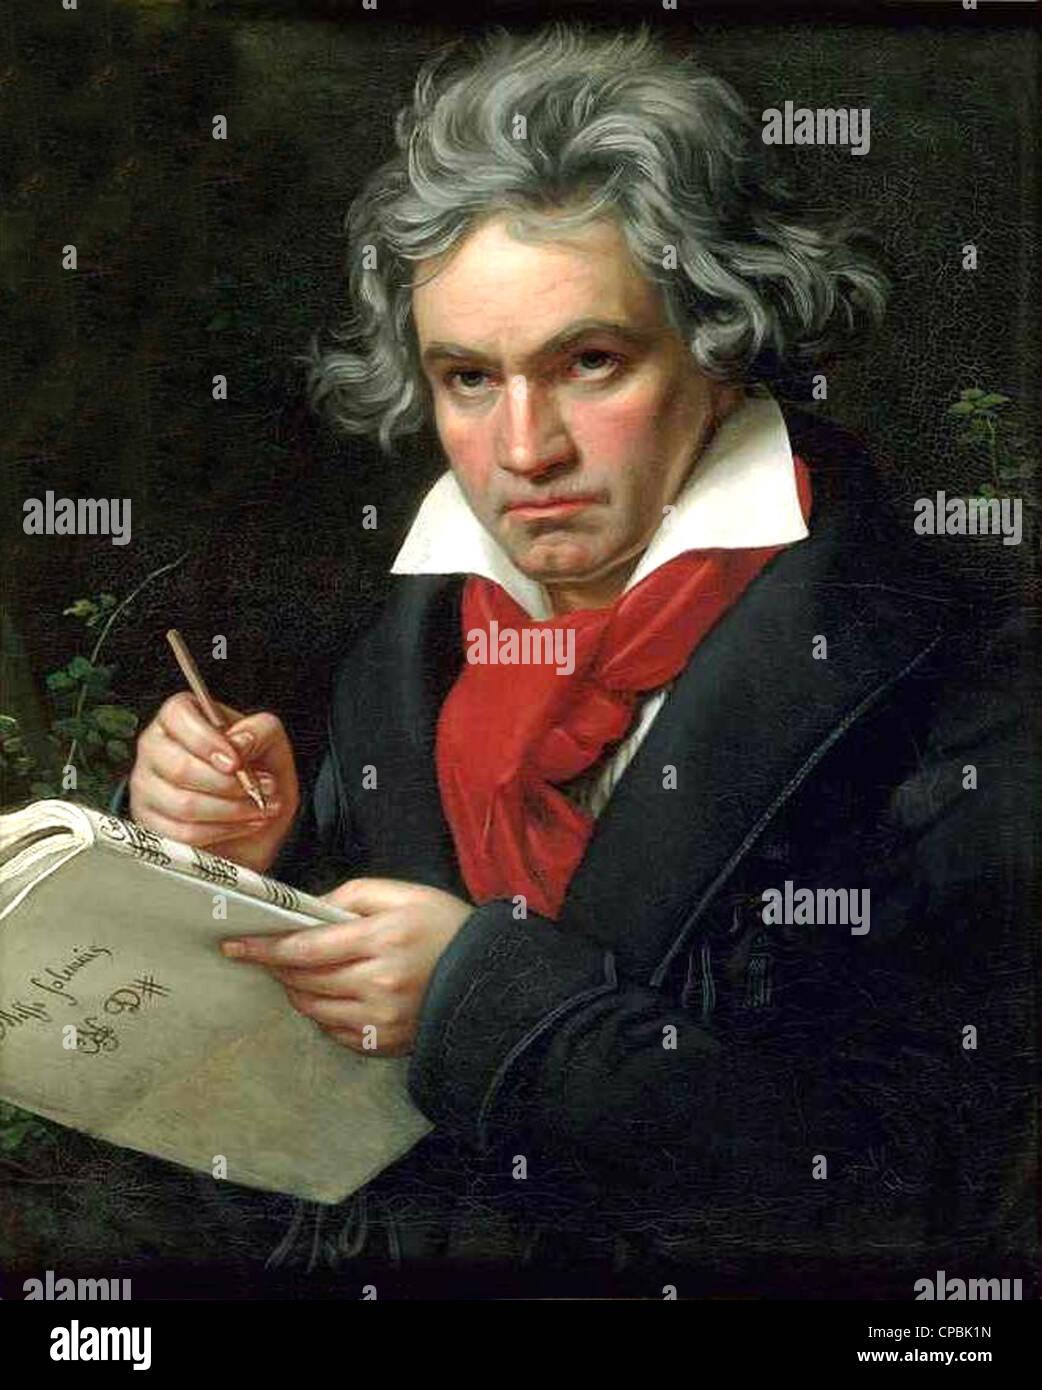 Painting of Ludwig van Beethoven in 1820 by Joseph Karl Stieler. - Stock Image